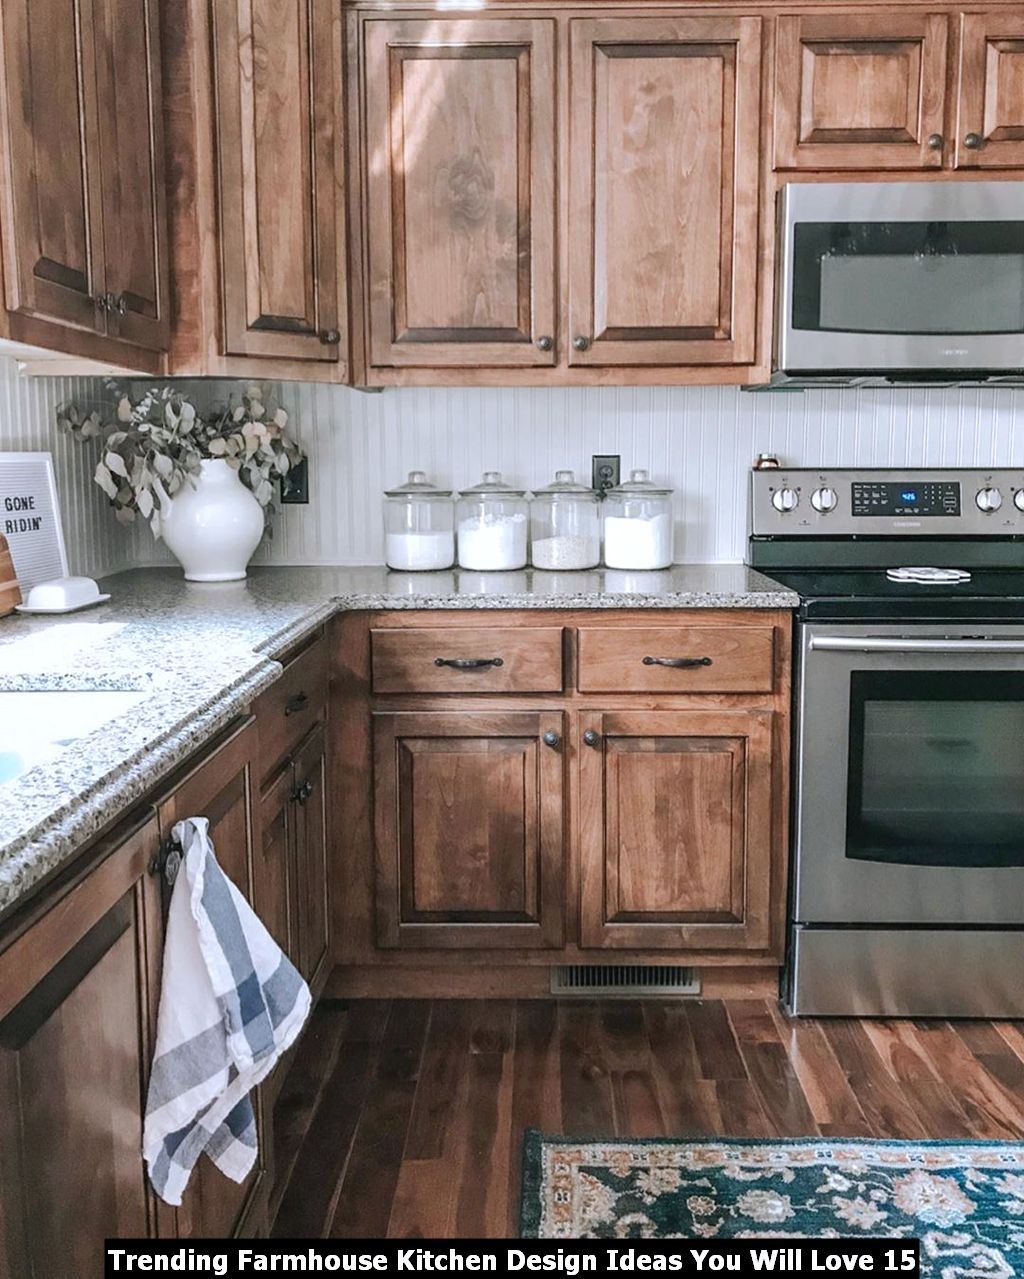 Trending Farmhouse Kitchen Design Ideas You Will Love 15